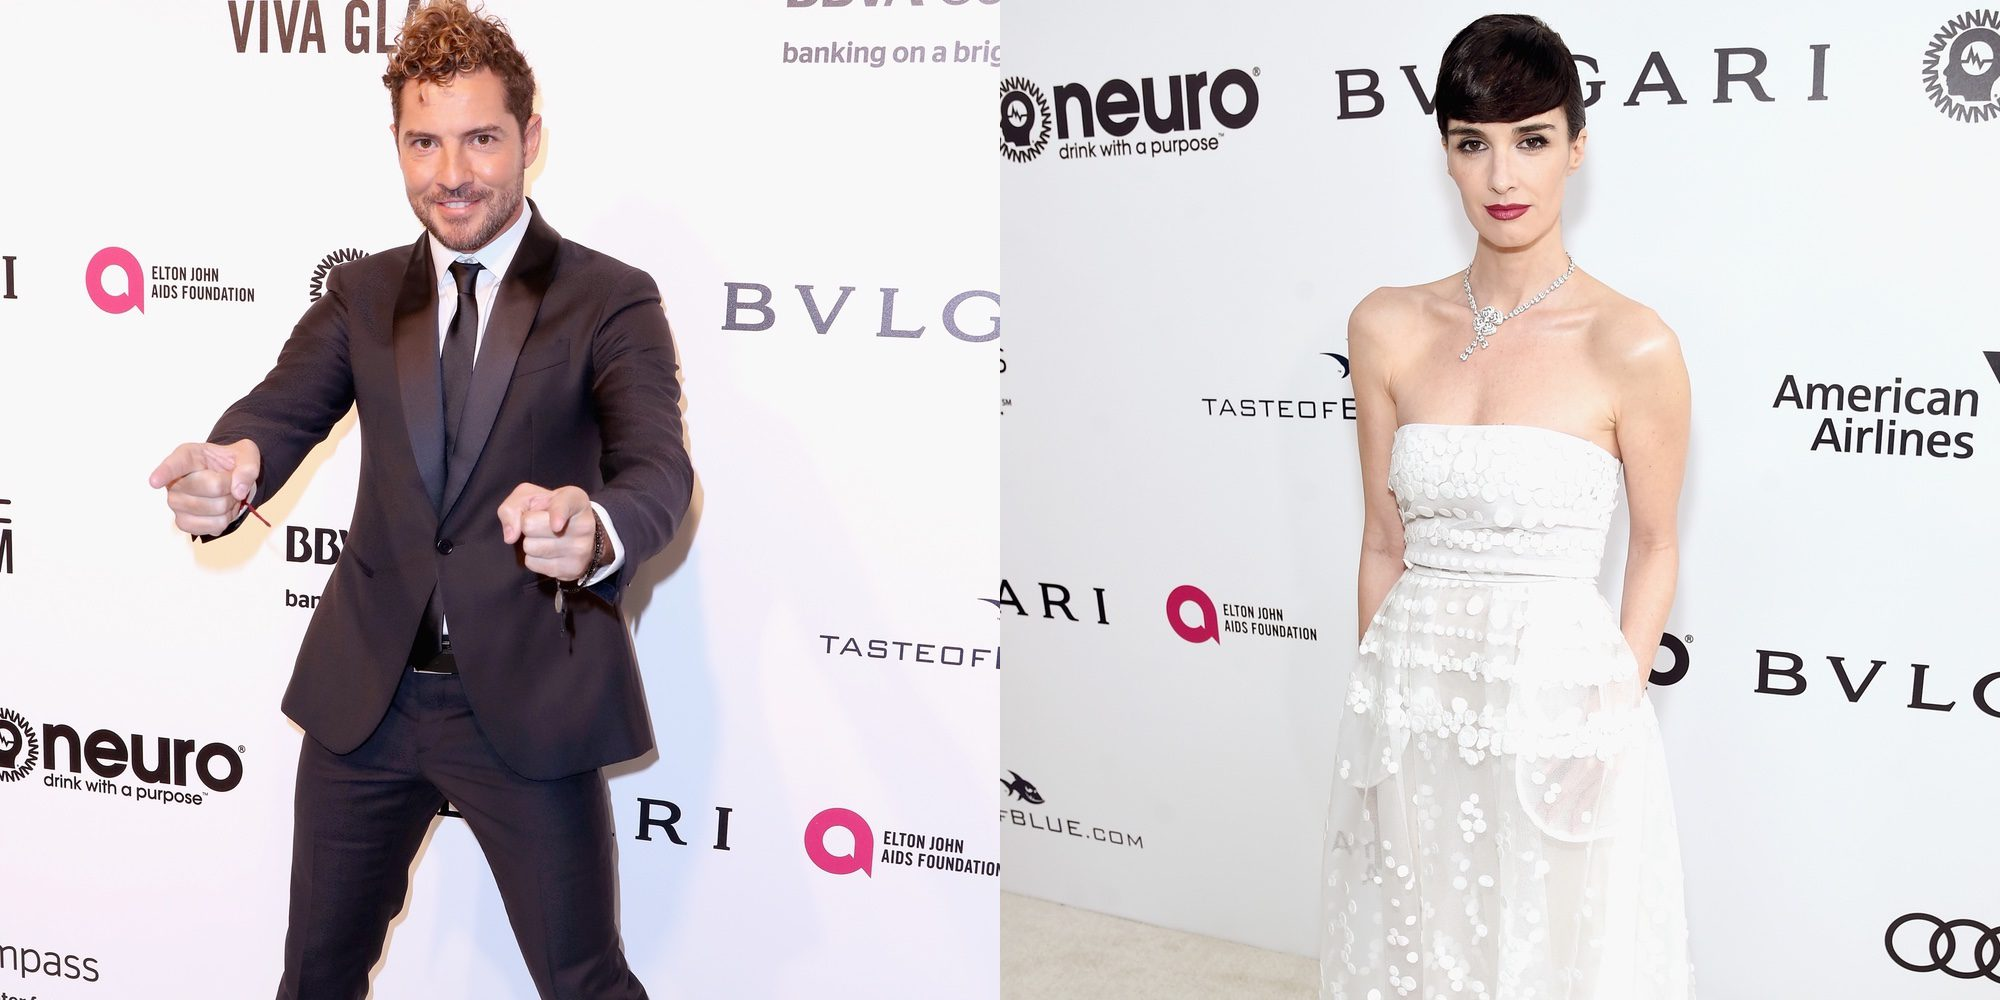 David Bisbal, Jon Kortajarena y Paz Vega: la representación española en las fiestas post-Oscar 2017